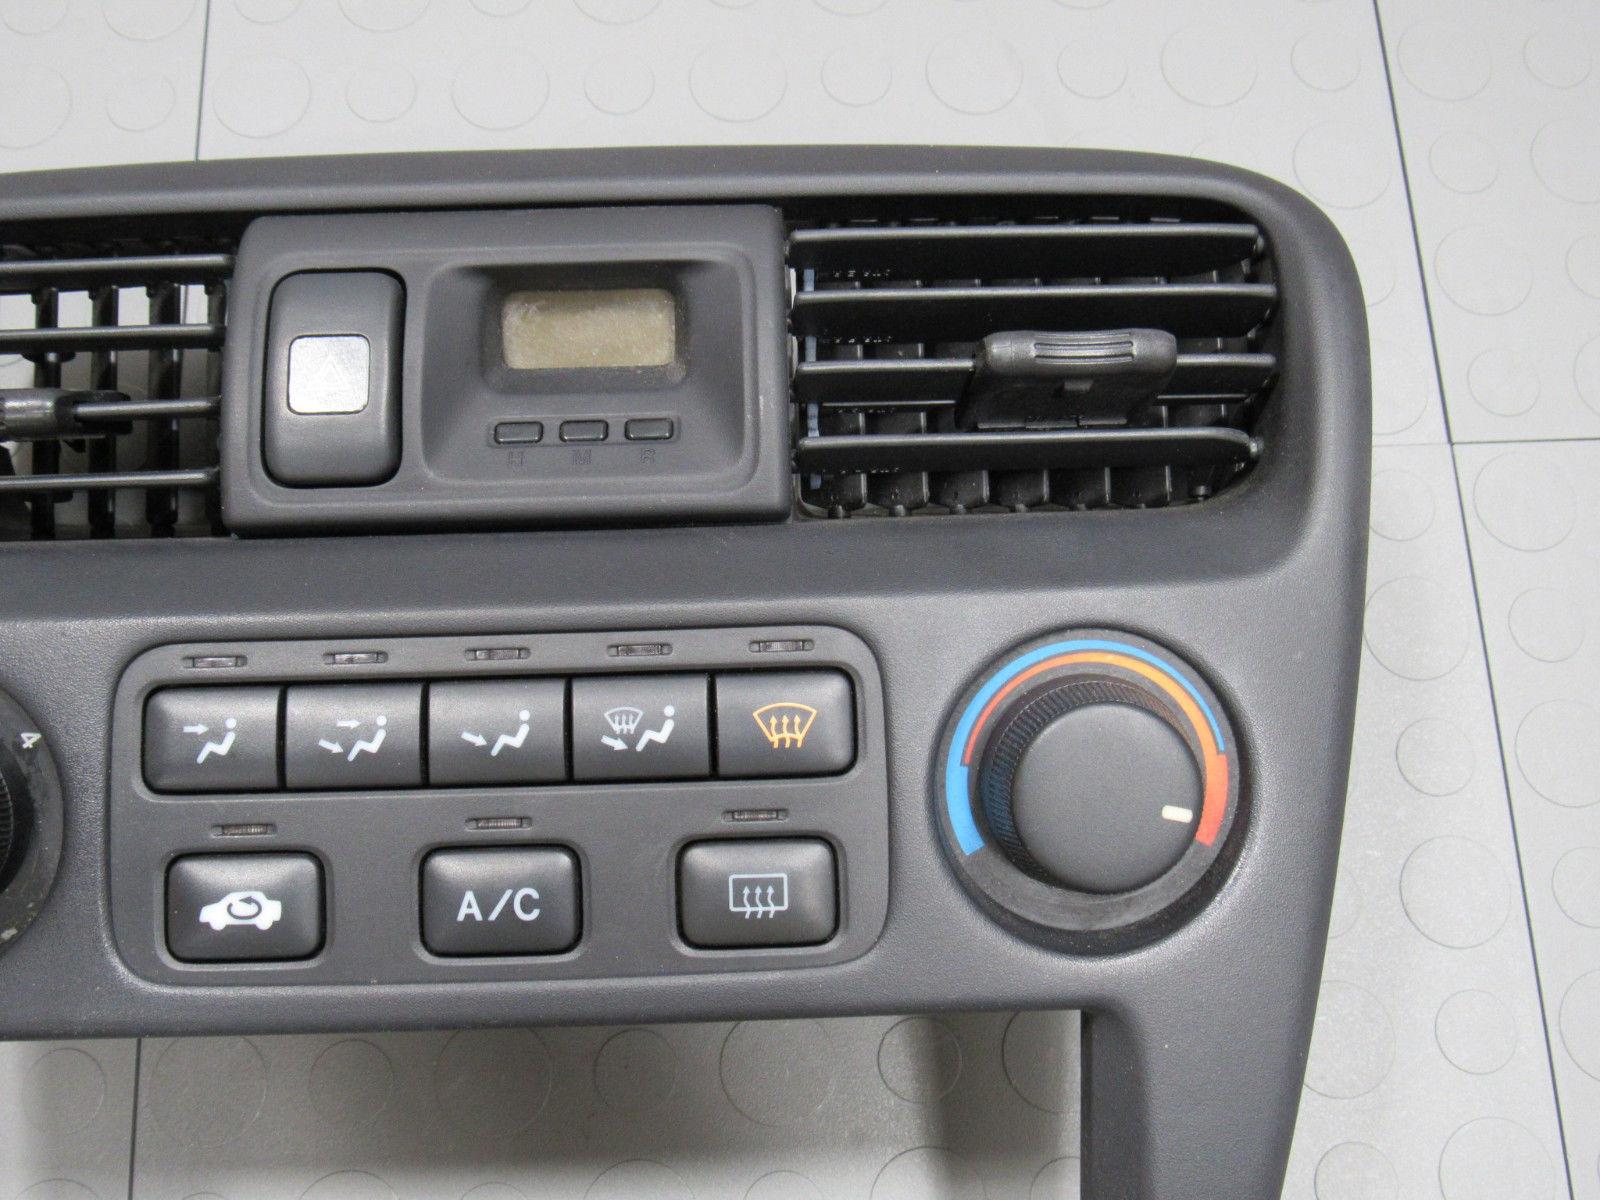 98 00 honda accord manual ac climate control dash radio bezel rh importapart com 98 honda accord manual swap 98 honda accord manual transmission